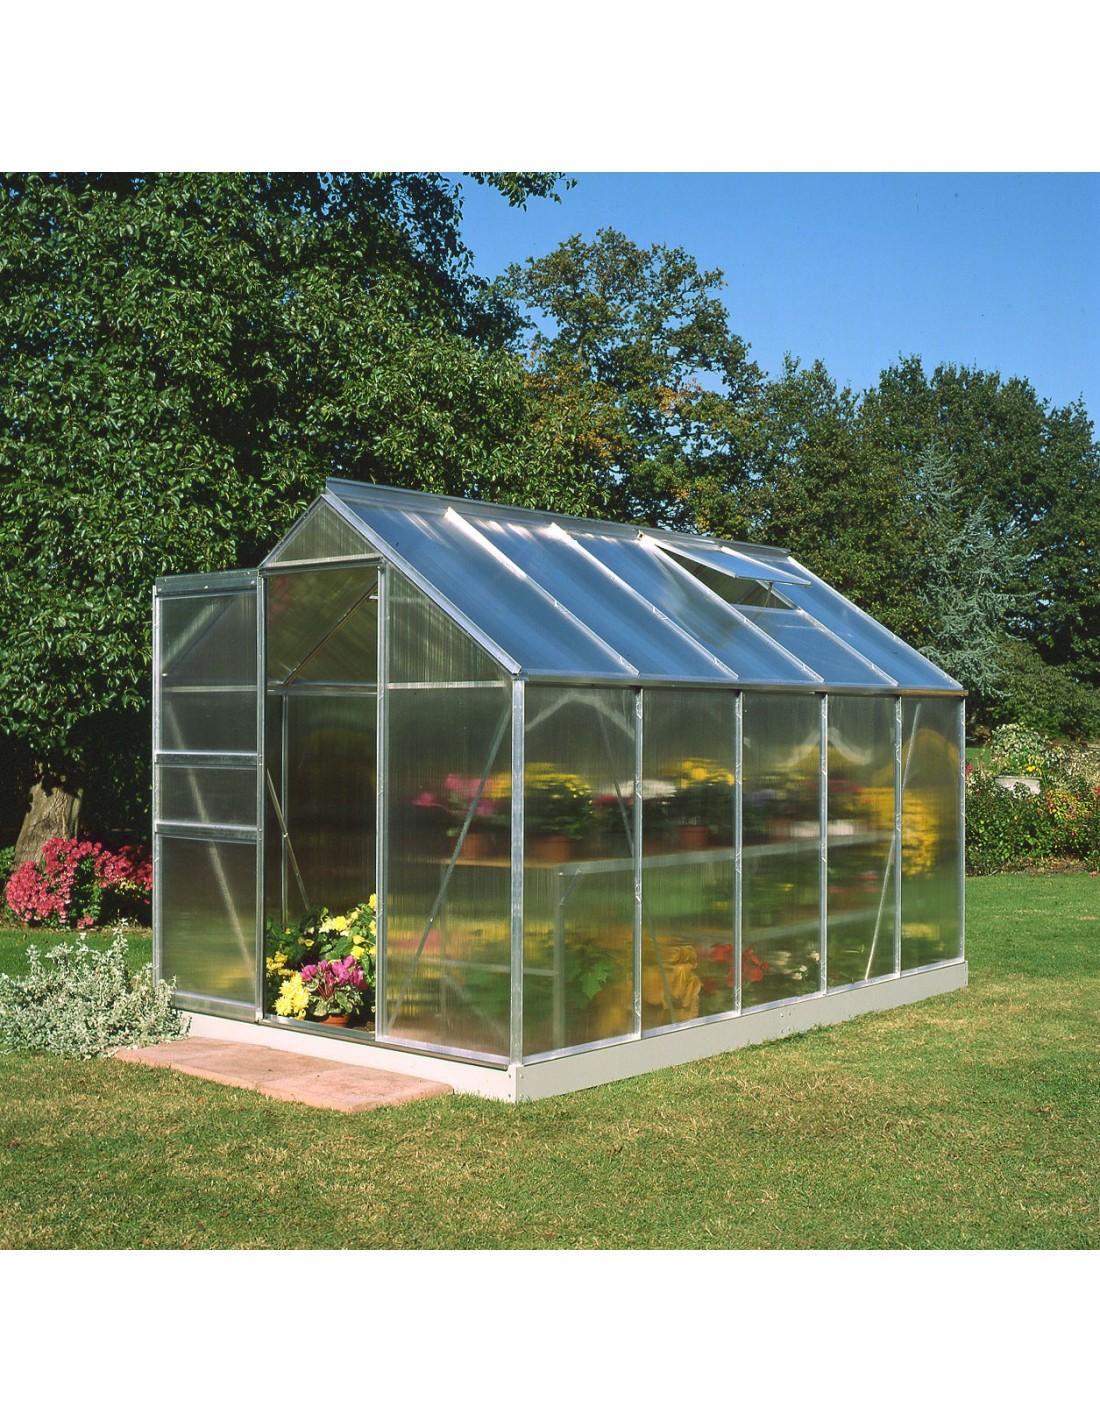 serre de jardin popular 6 2 m polycarbonate de 4 mm. Black Bedroom Furniture Sets. Home Design Ideas